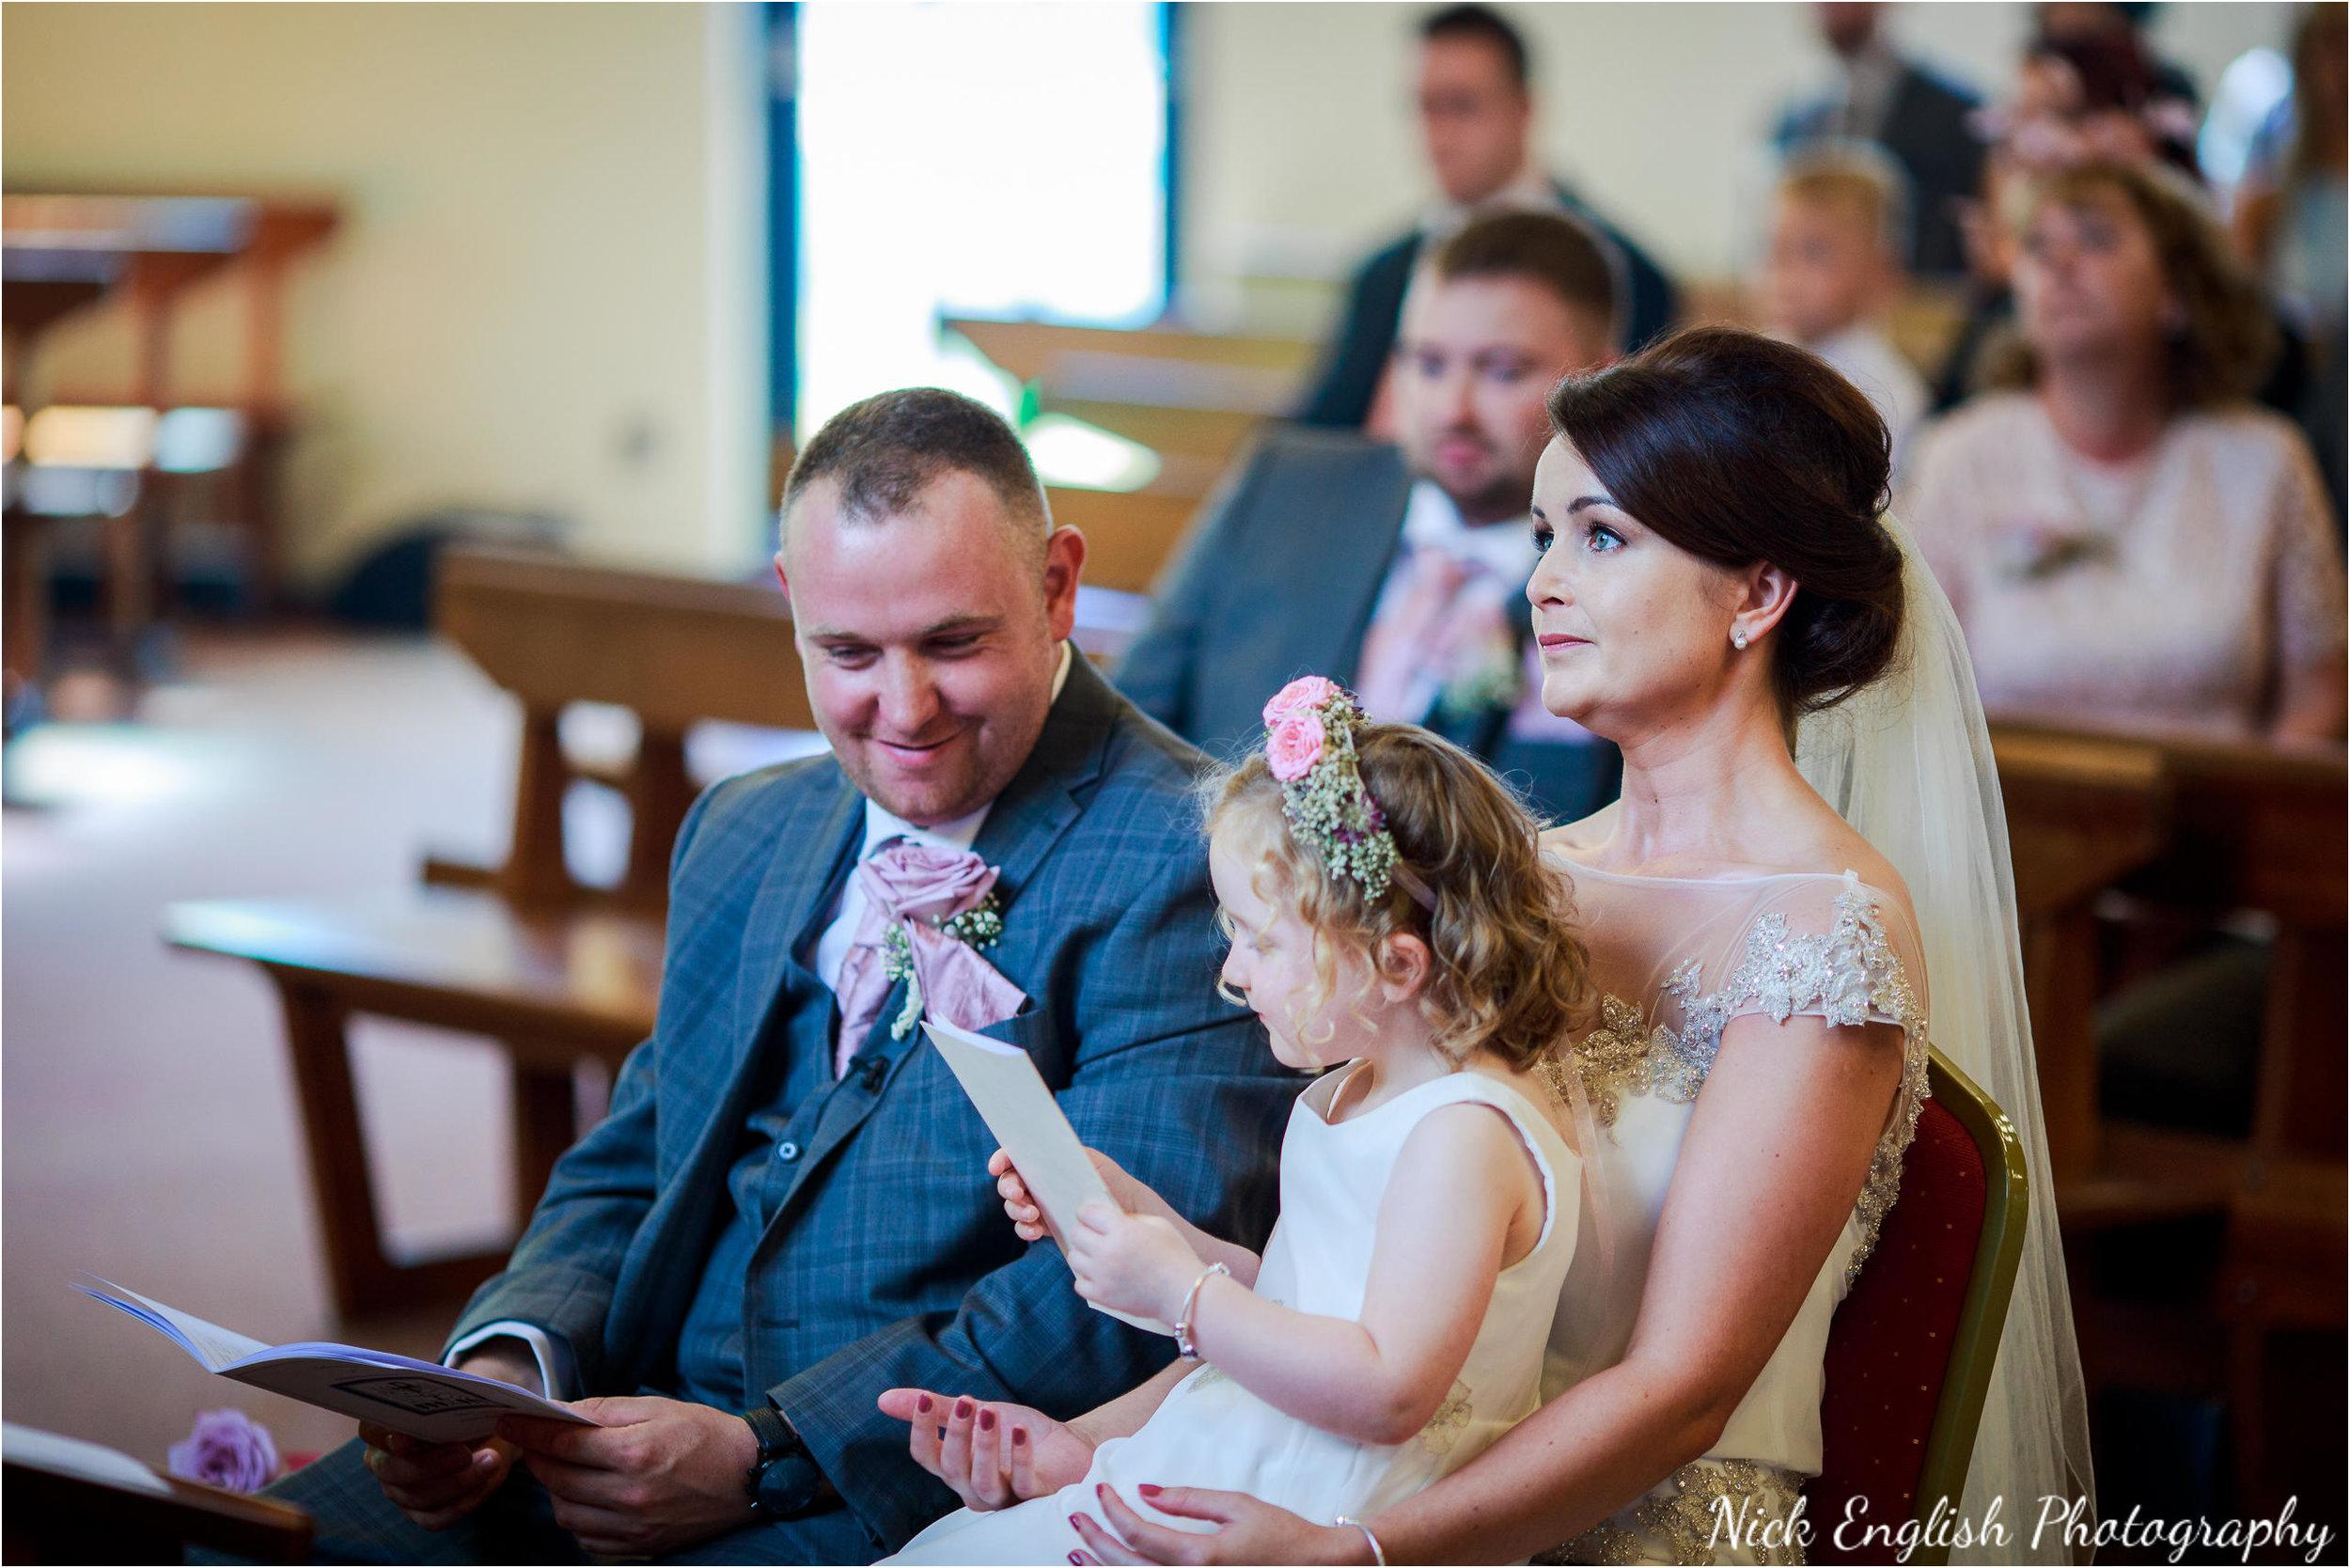 Stacey-Ash-Wedding-Photographs-Stanley-House-Preston-Lancashire-53.jpg